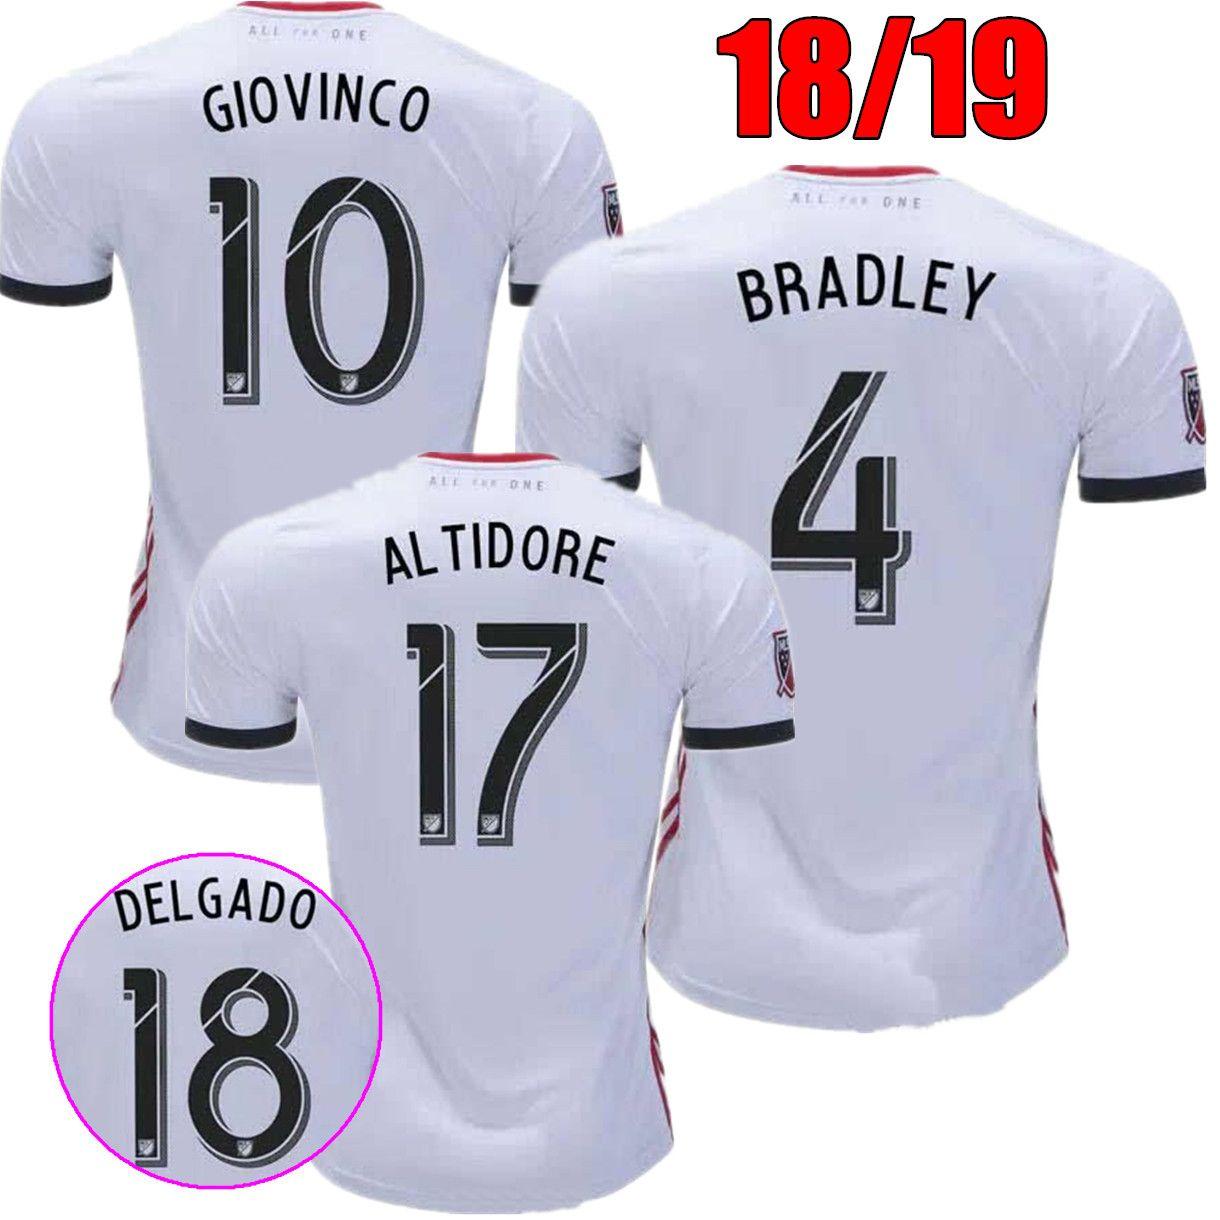 2018 2019 Toronto Visitante Jersey De Fútbol 18 19   10 GIOVINCO   4  BRADLEY 17 ALTIDORE Futbol Blanco Camiseta Personalizada MLS Kit Fútbol  Uniforme ... d4b03e4ac912a